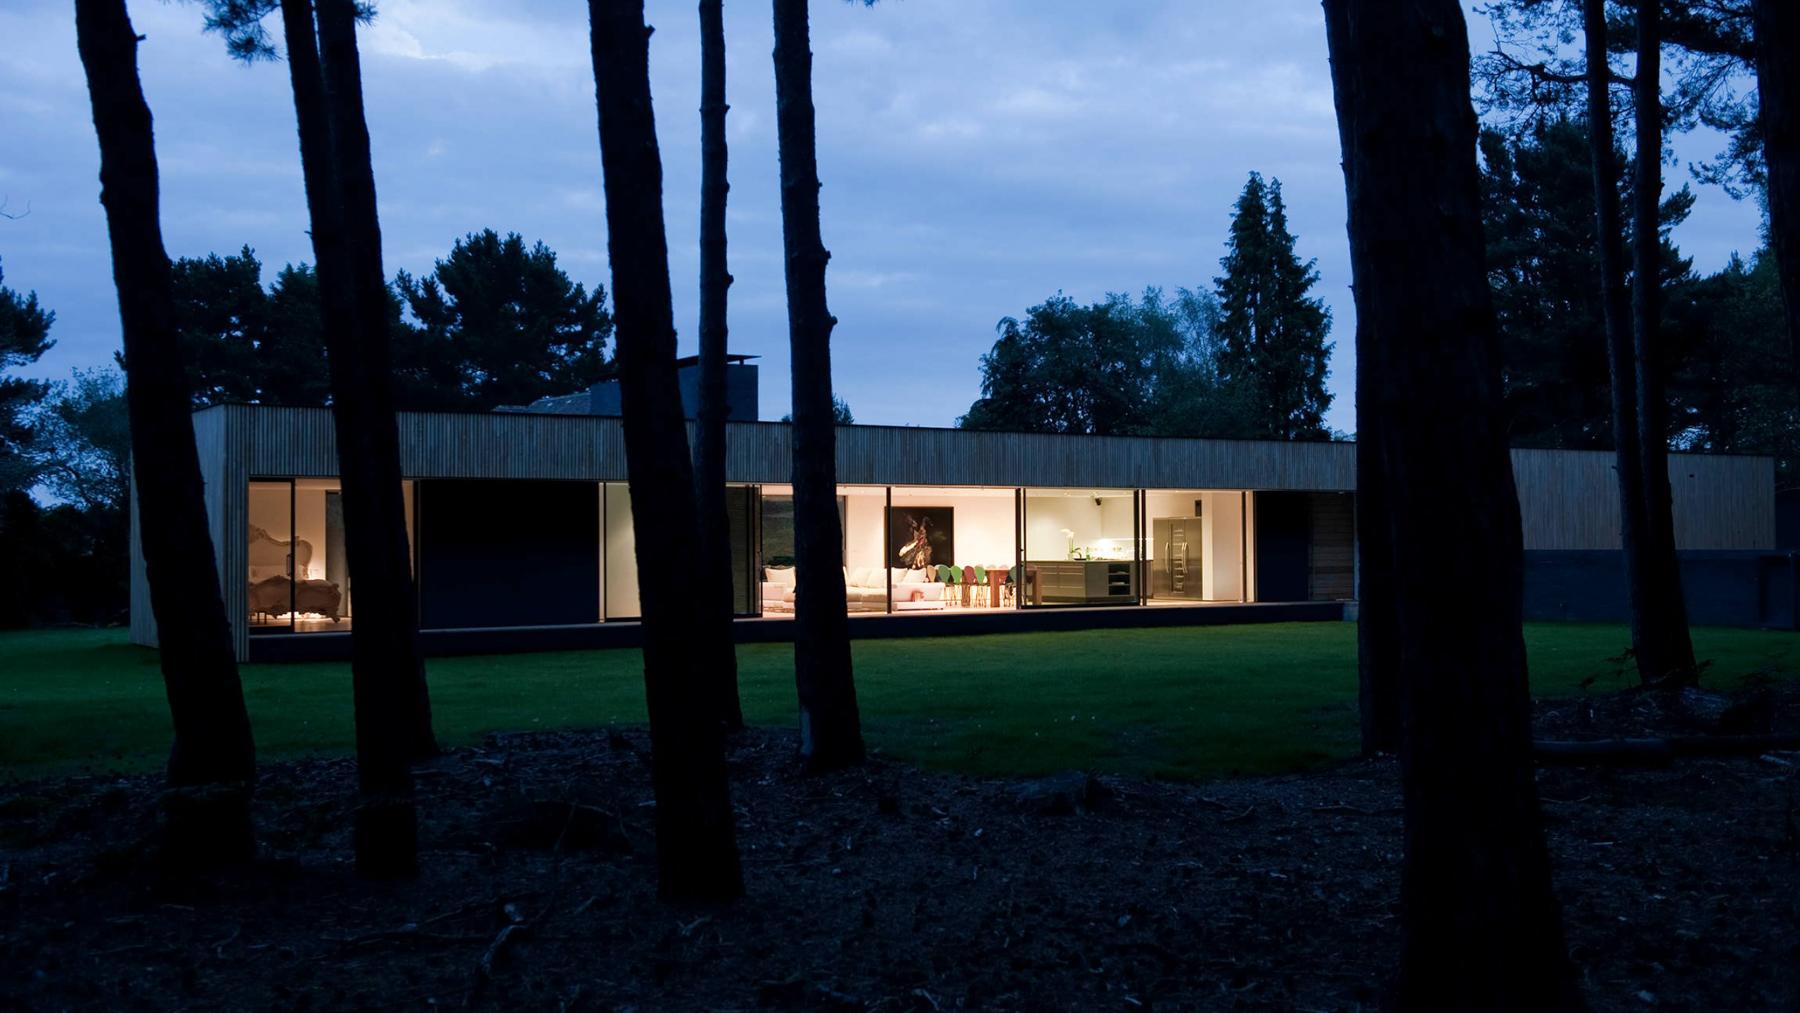 CroppedFocusedImage25601440-Strom-Architects-Watson-1.jpg